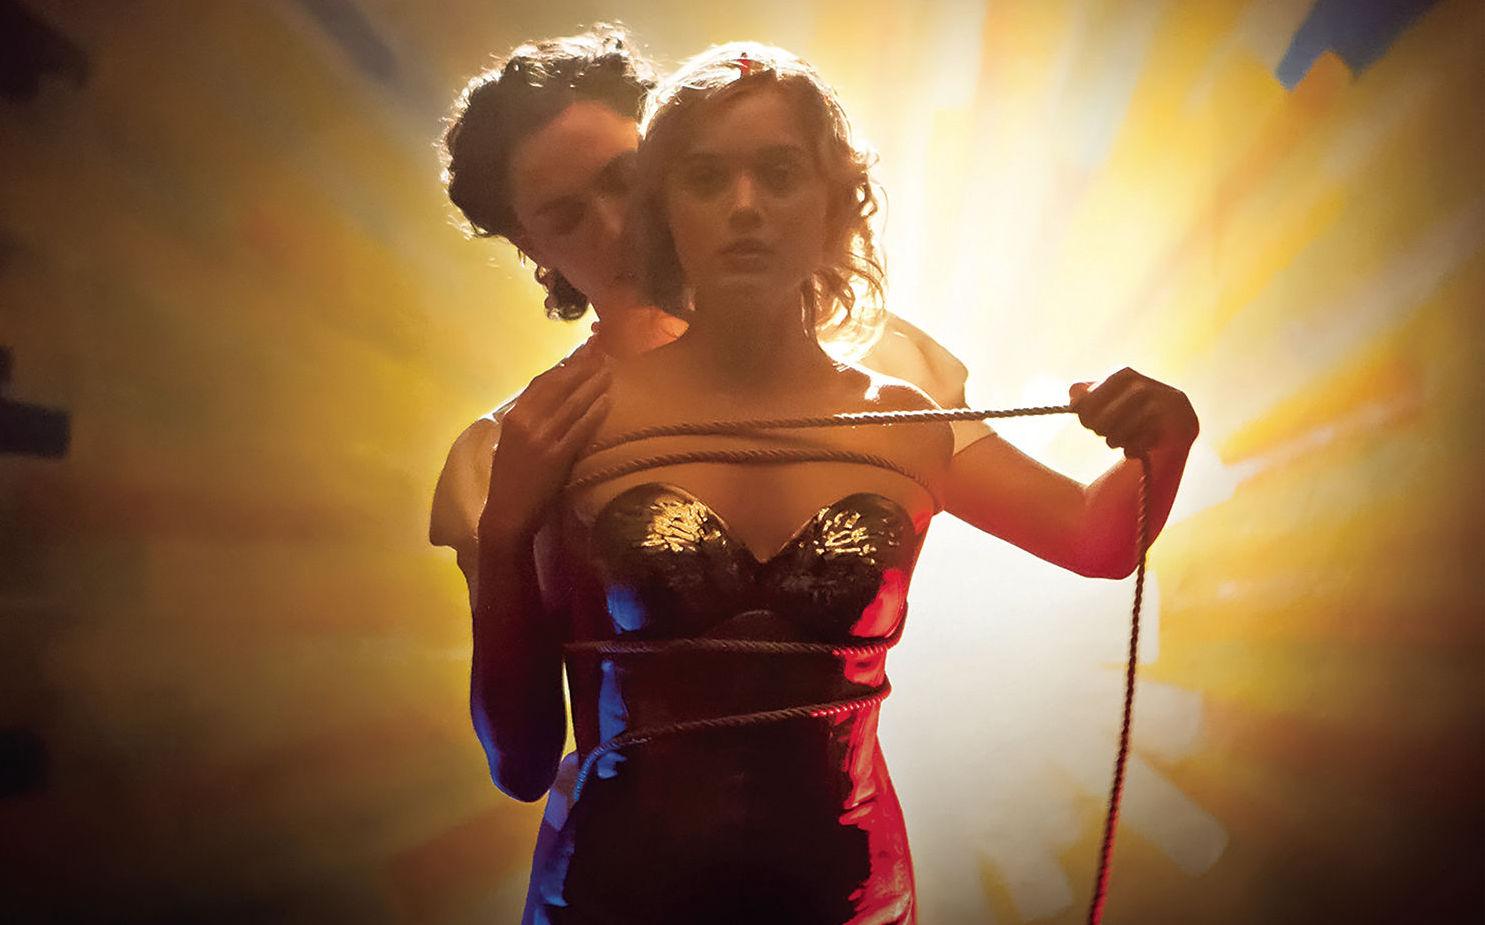 Rebecca Hall, Bella Heathcote - Wonder Woman's origin in bondage imagery in Professor Marston and the Wonder Women (2017)